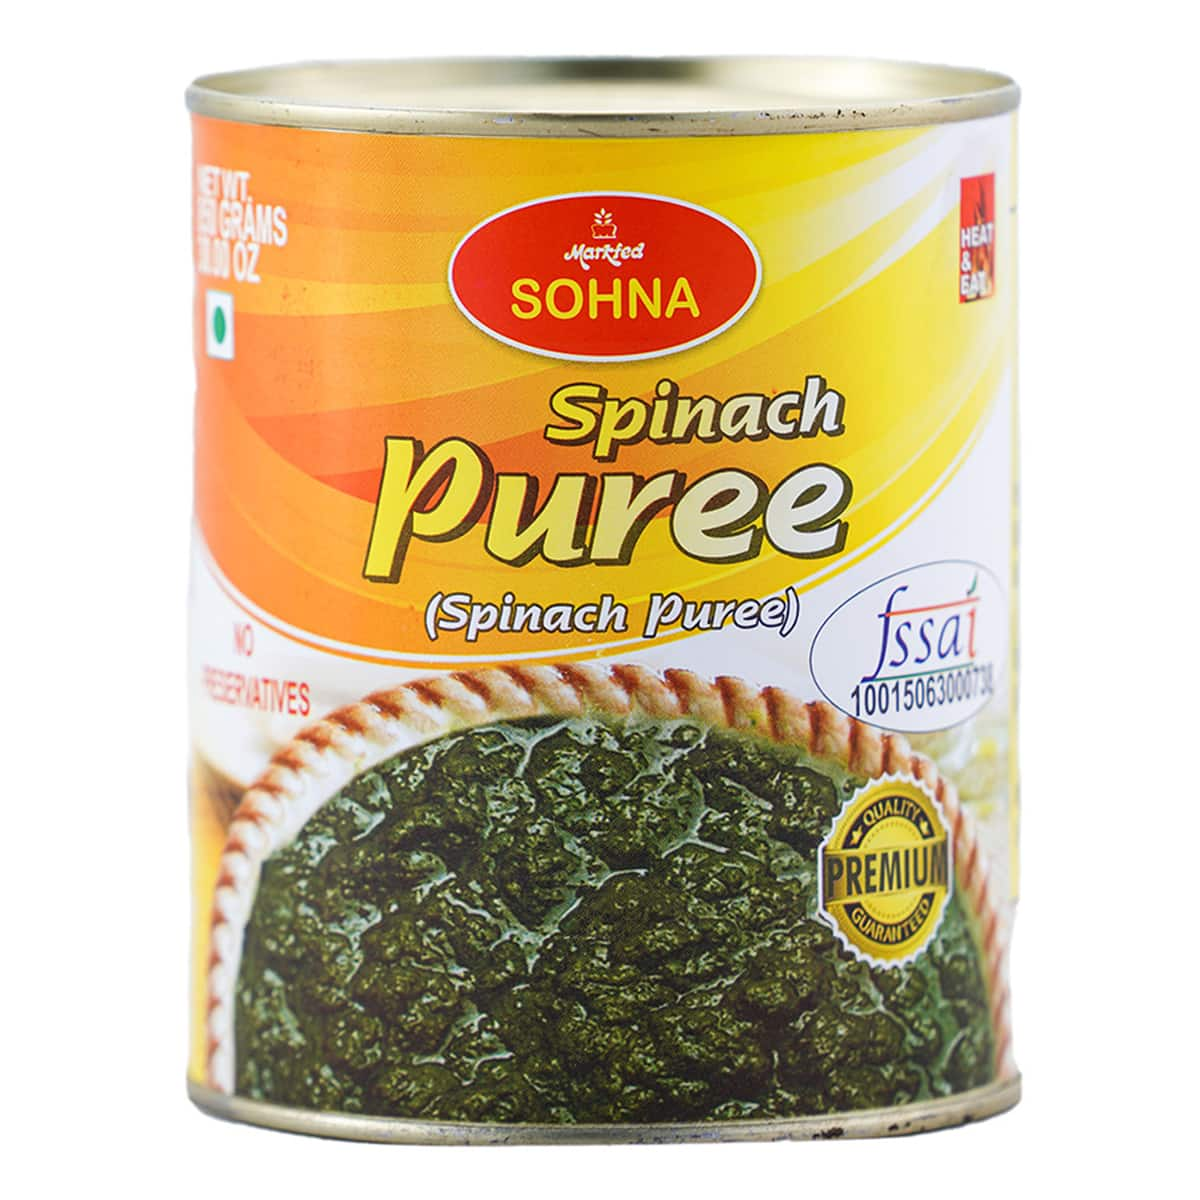 Buy Markfed Sohna Spinach Puree - 450 gm